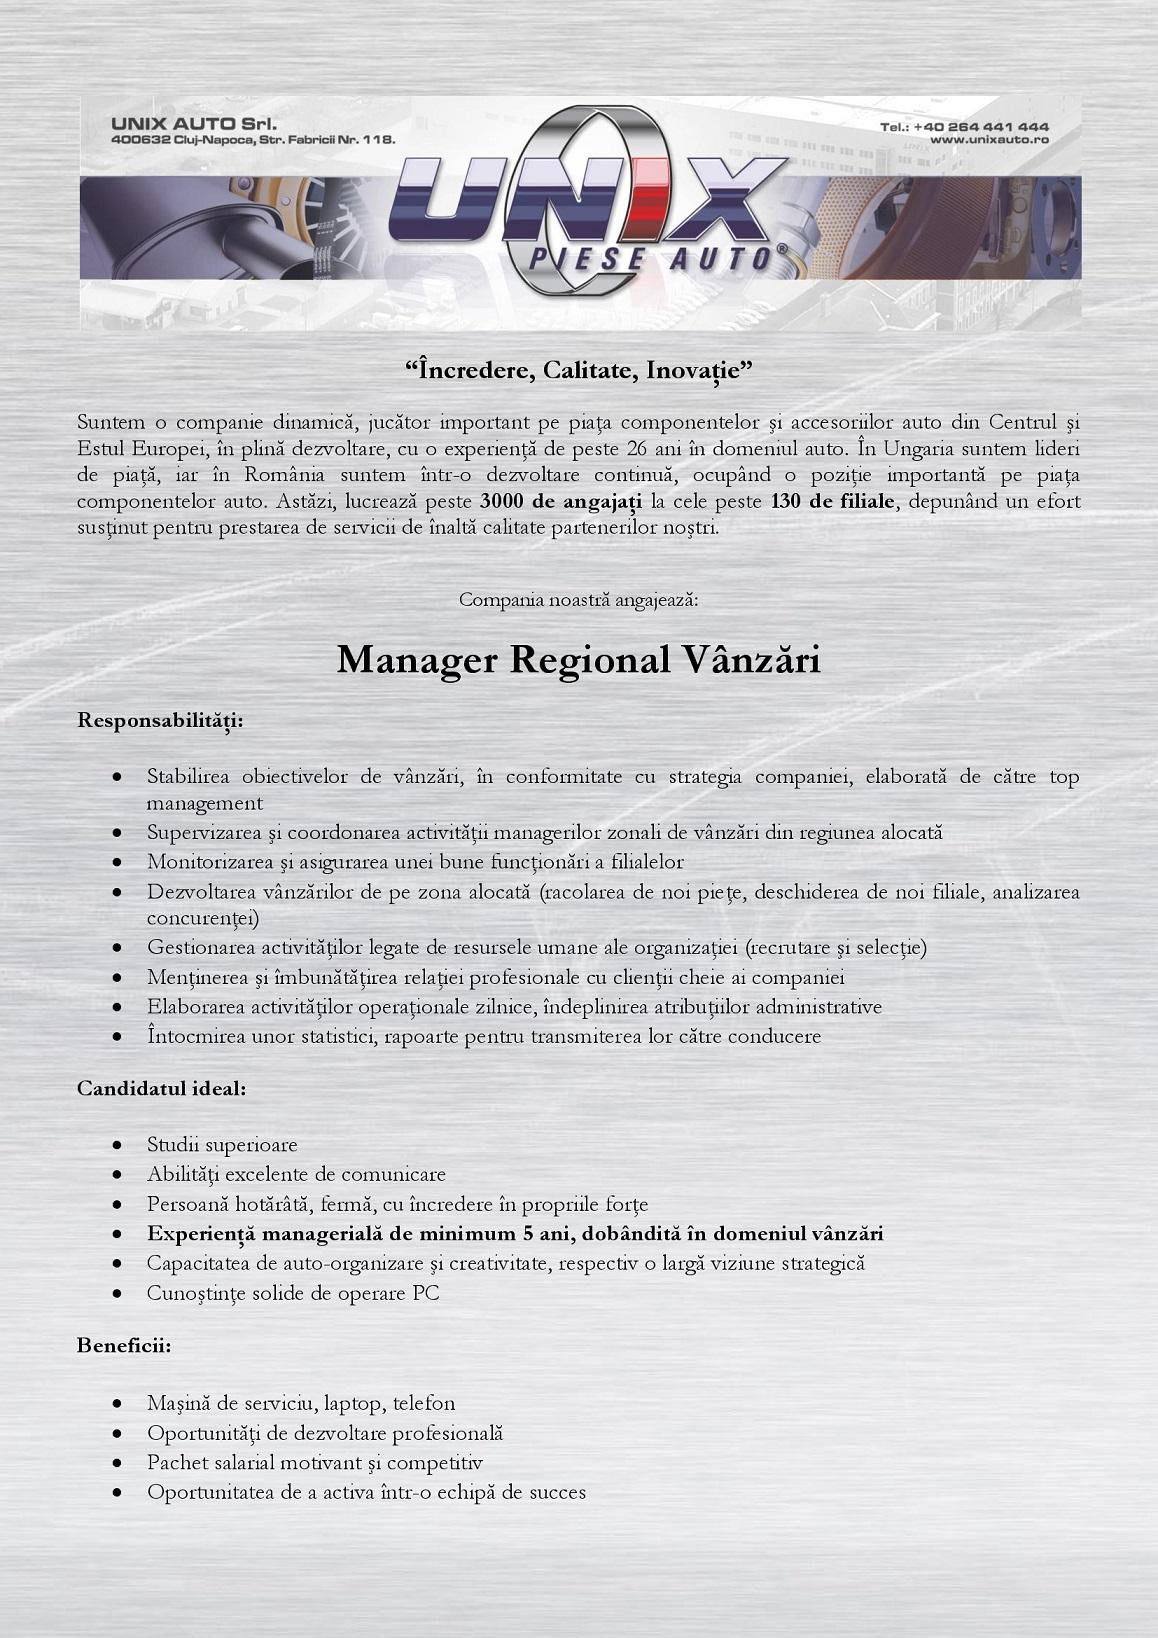 Manager Regional Vânzări